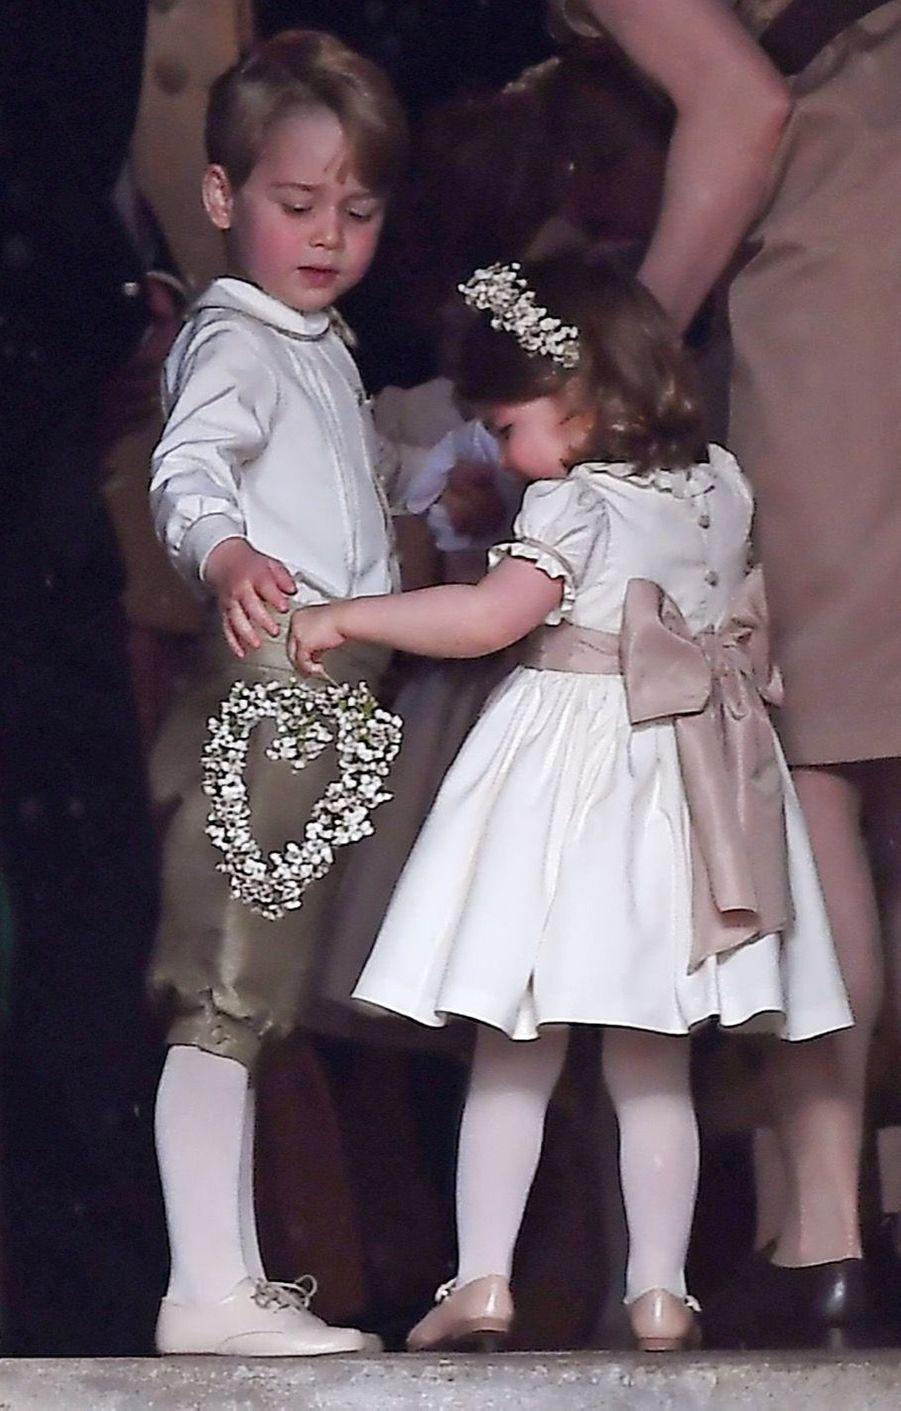 Mariage De Pippa Middleton : George et Charlotte attendent leur tante